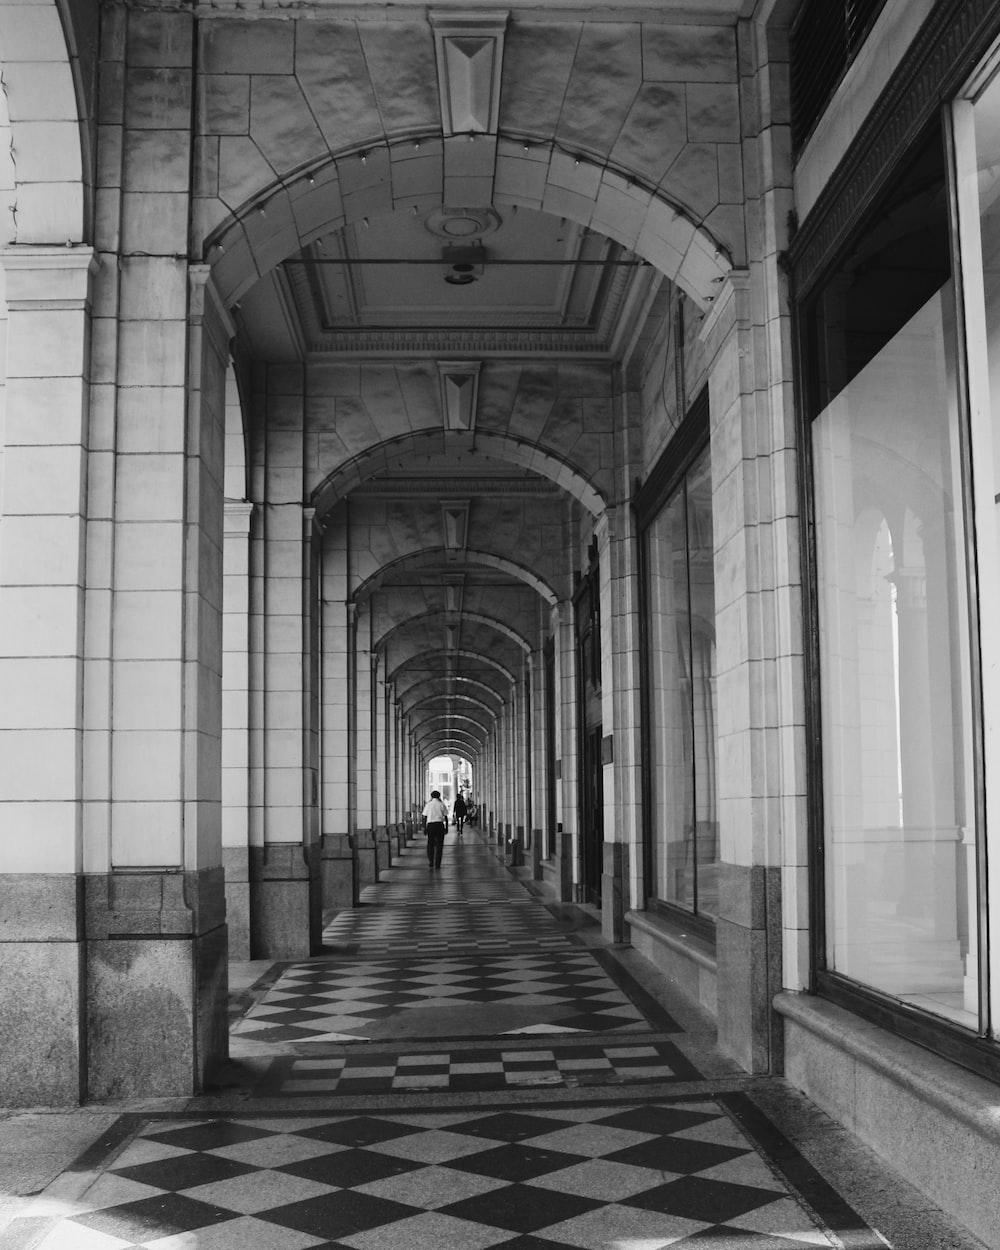 grayscale photo of hallway with glass windows